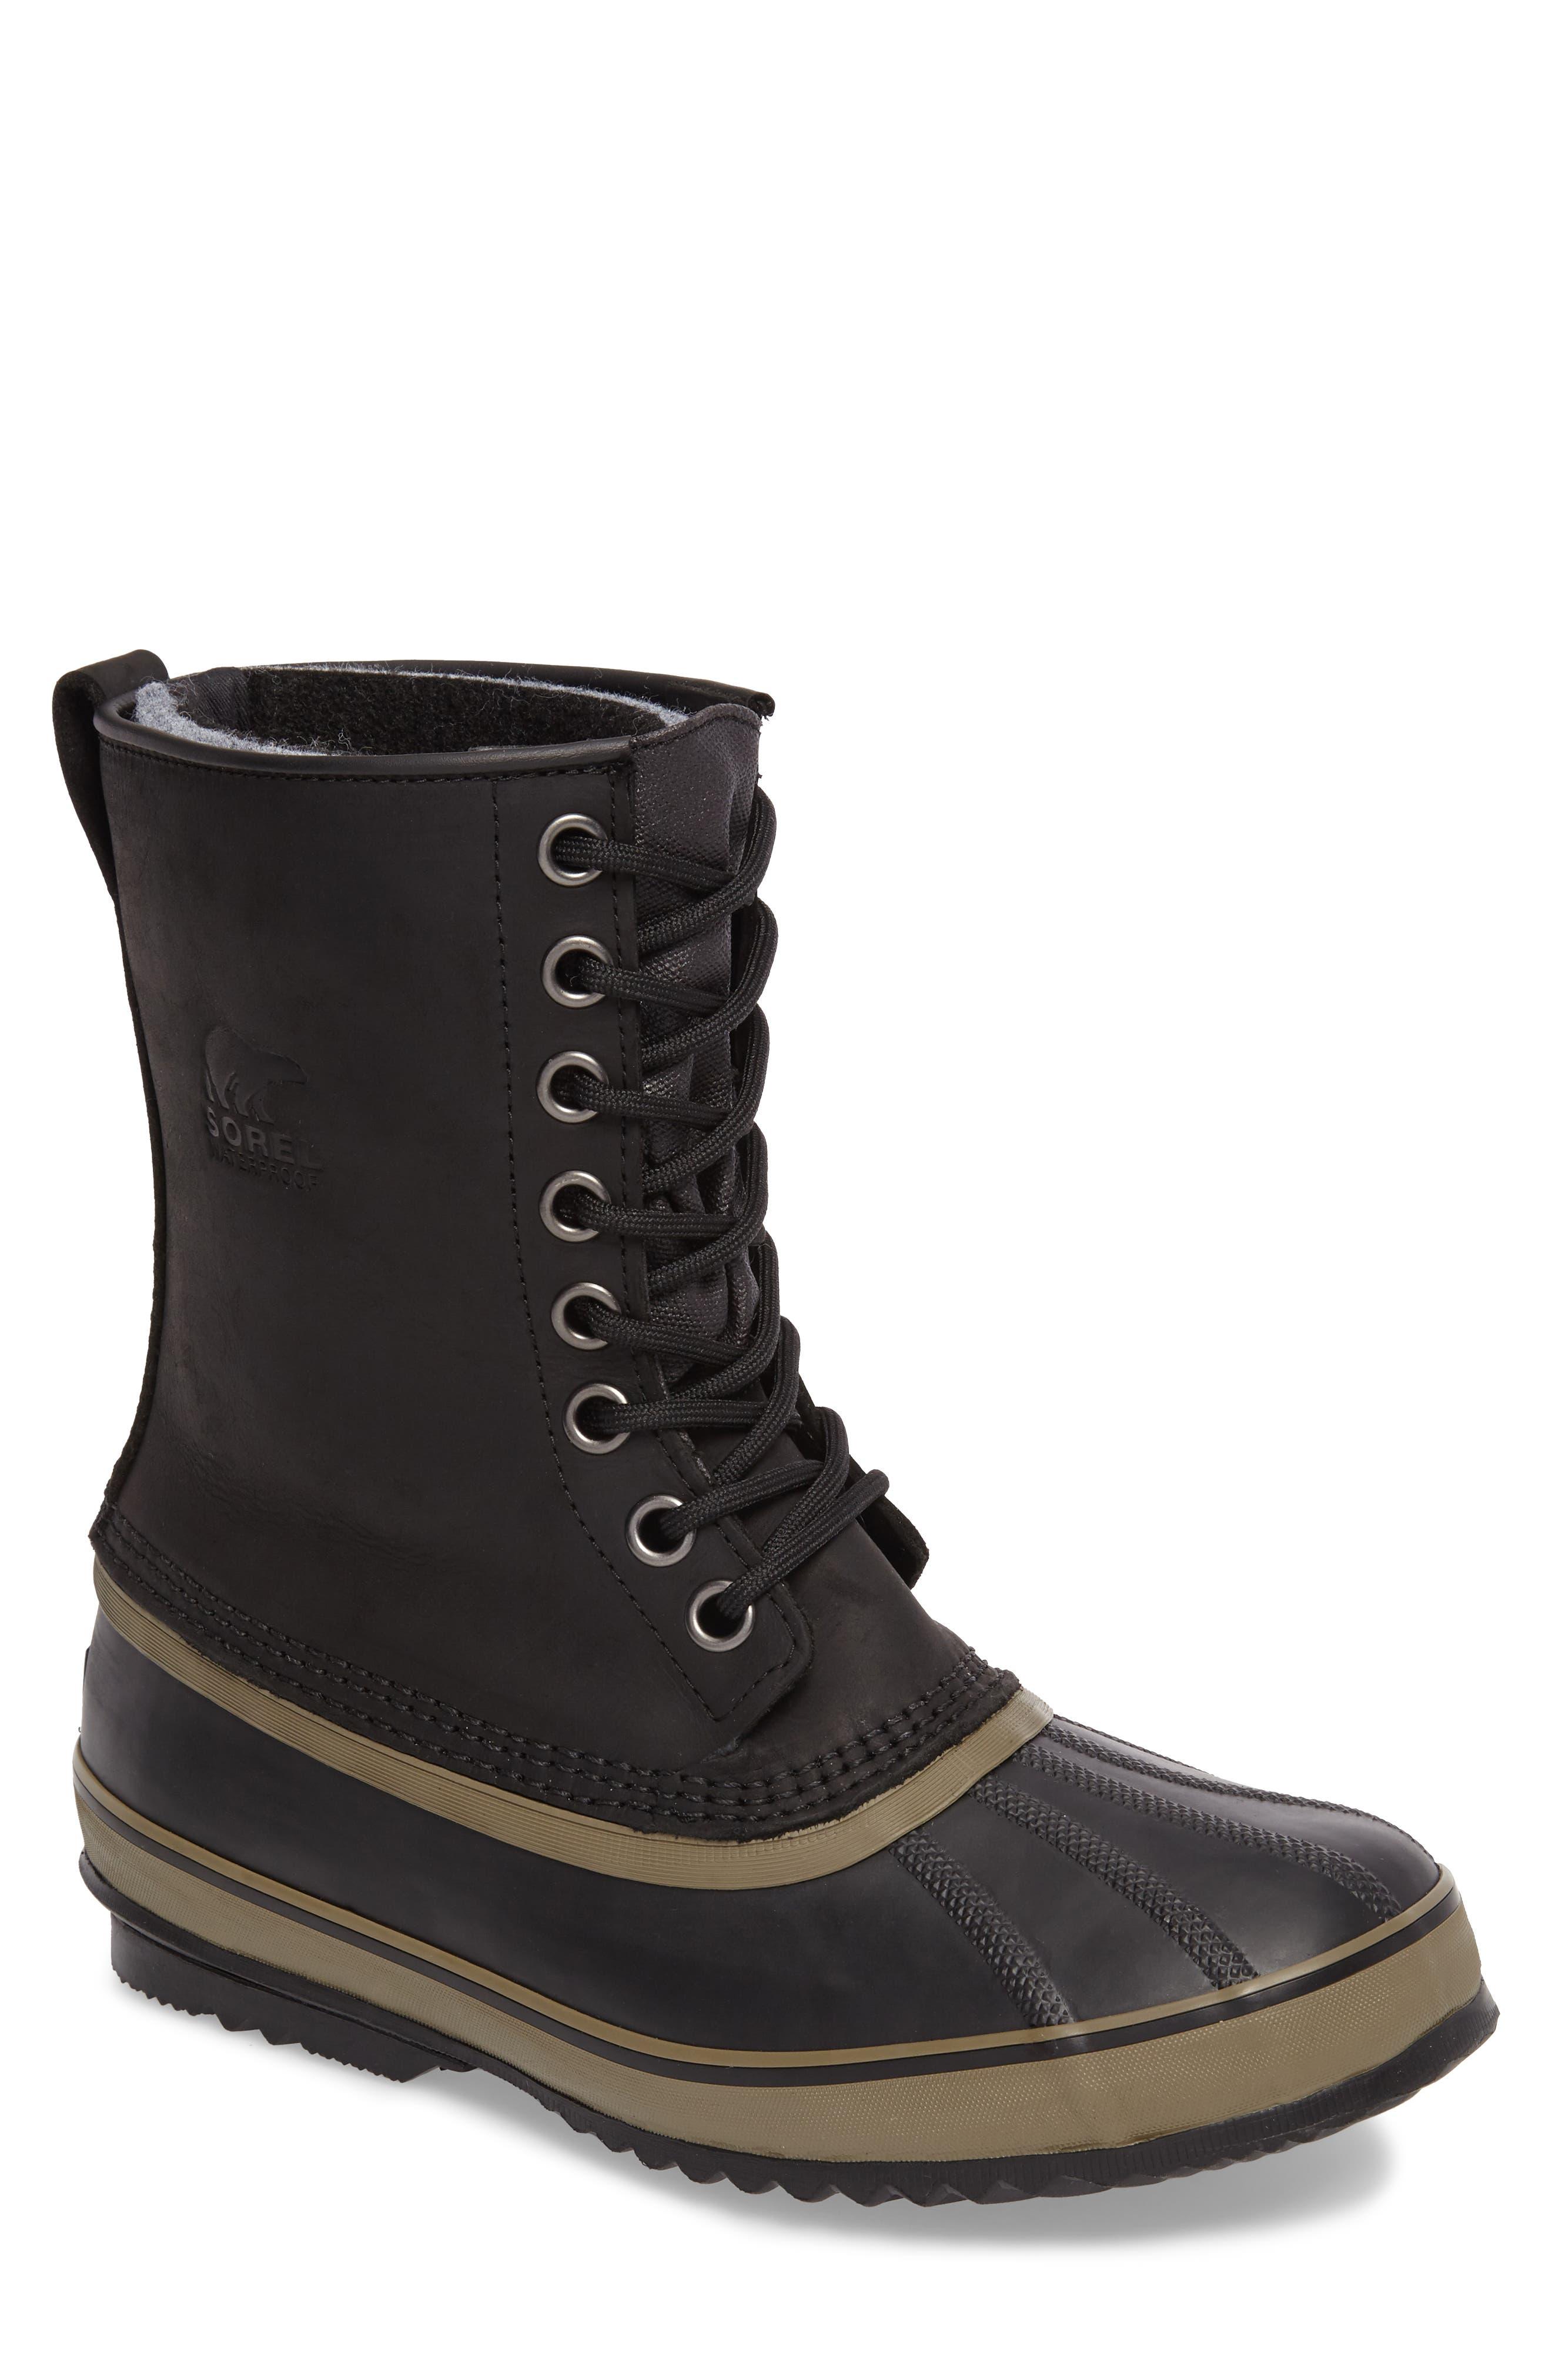 Sorel 1964 Premium T Snow Waterproof Boot- Black